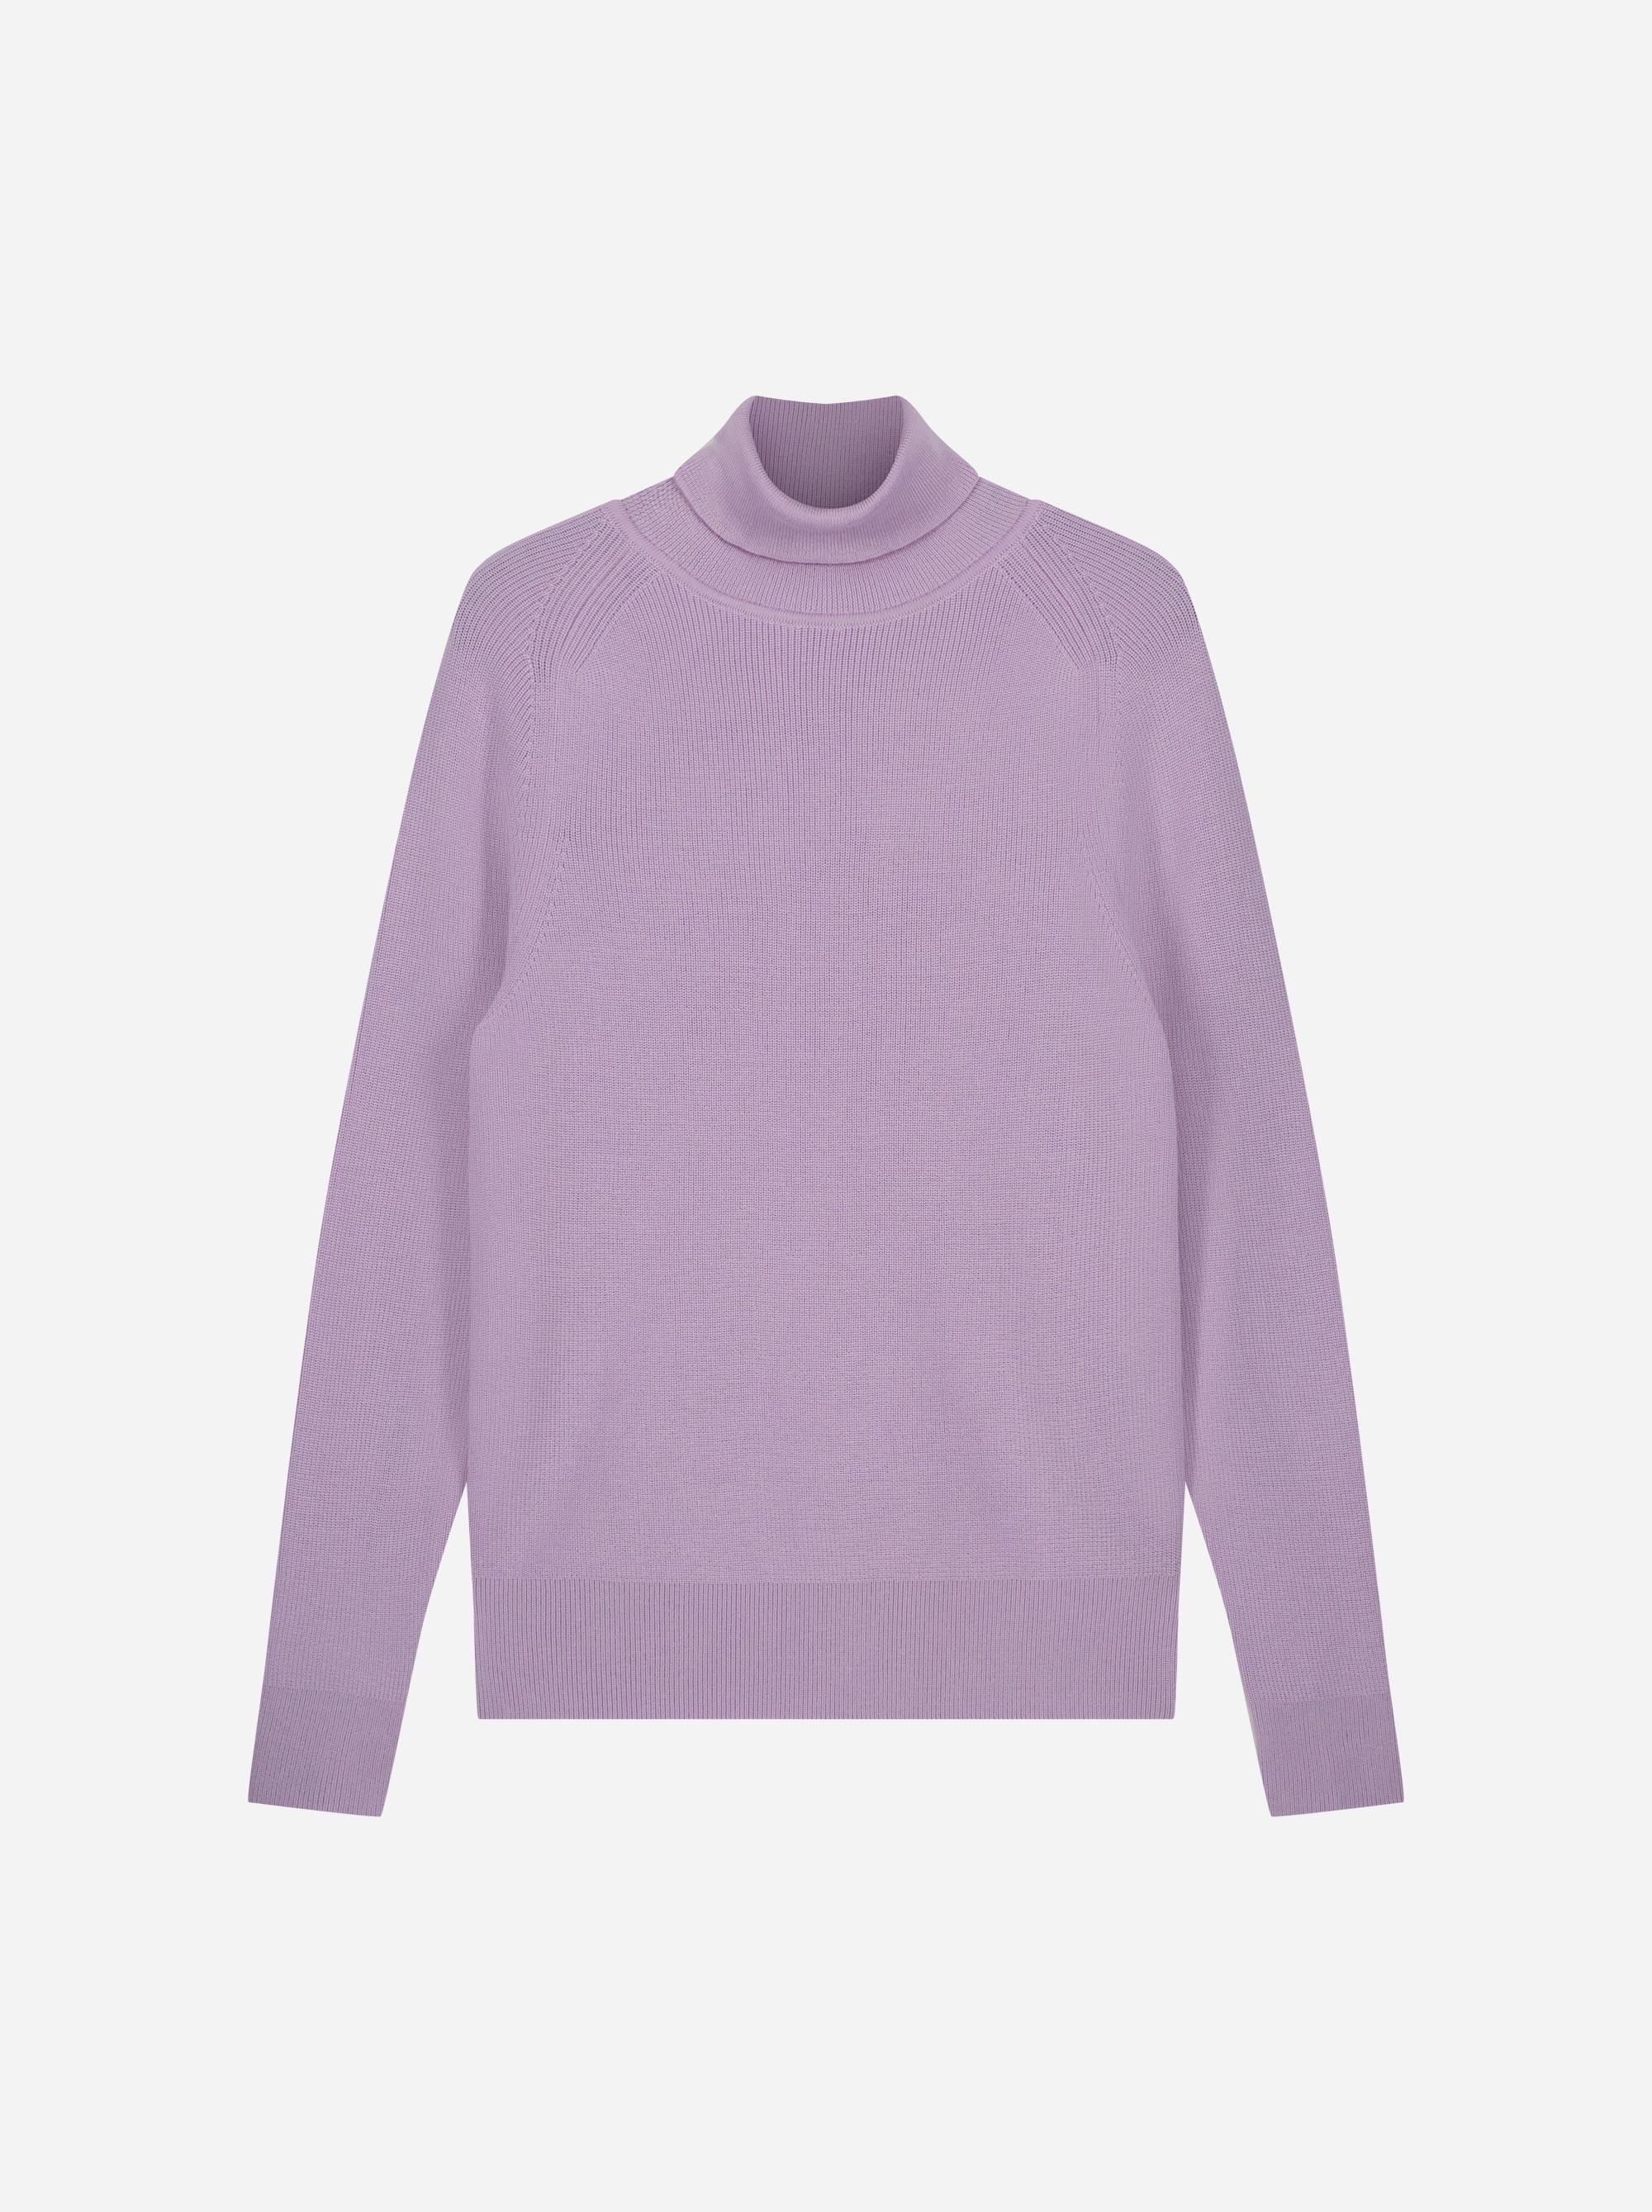 Teym_Merino-Sweater-Turtleneck_Lila_front_1